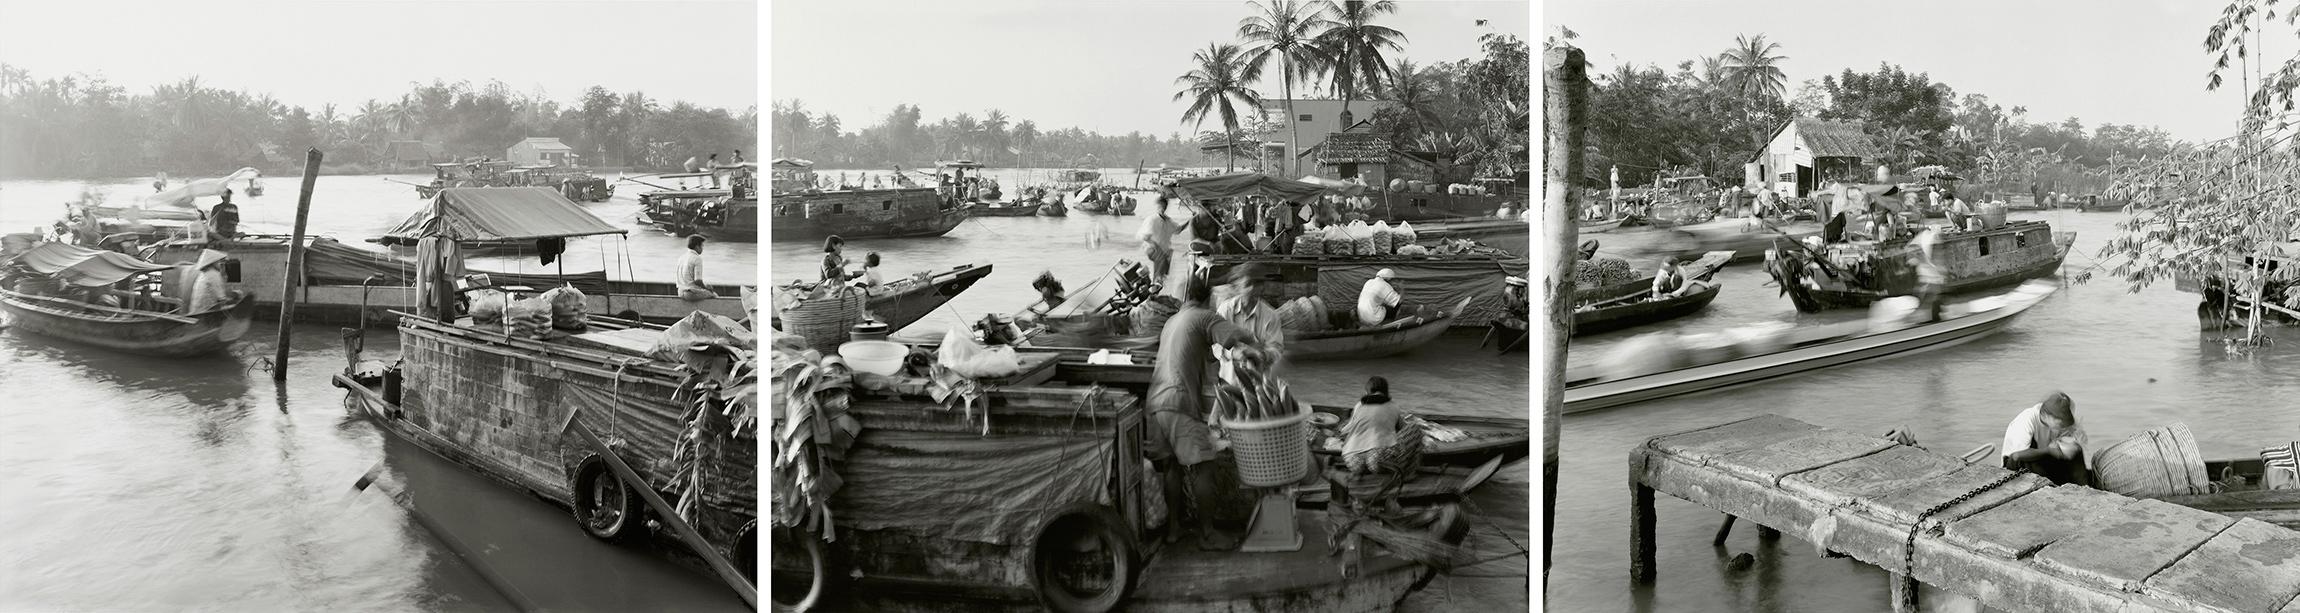 Mekong-Market-(triptych).jpg